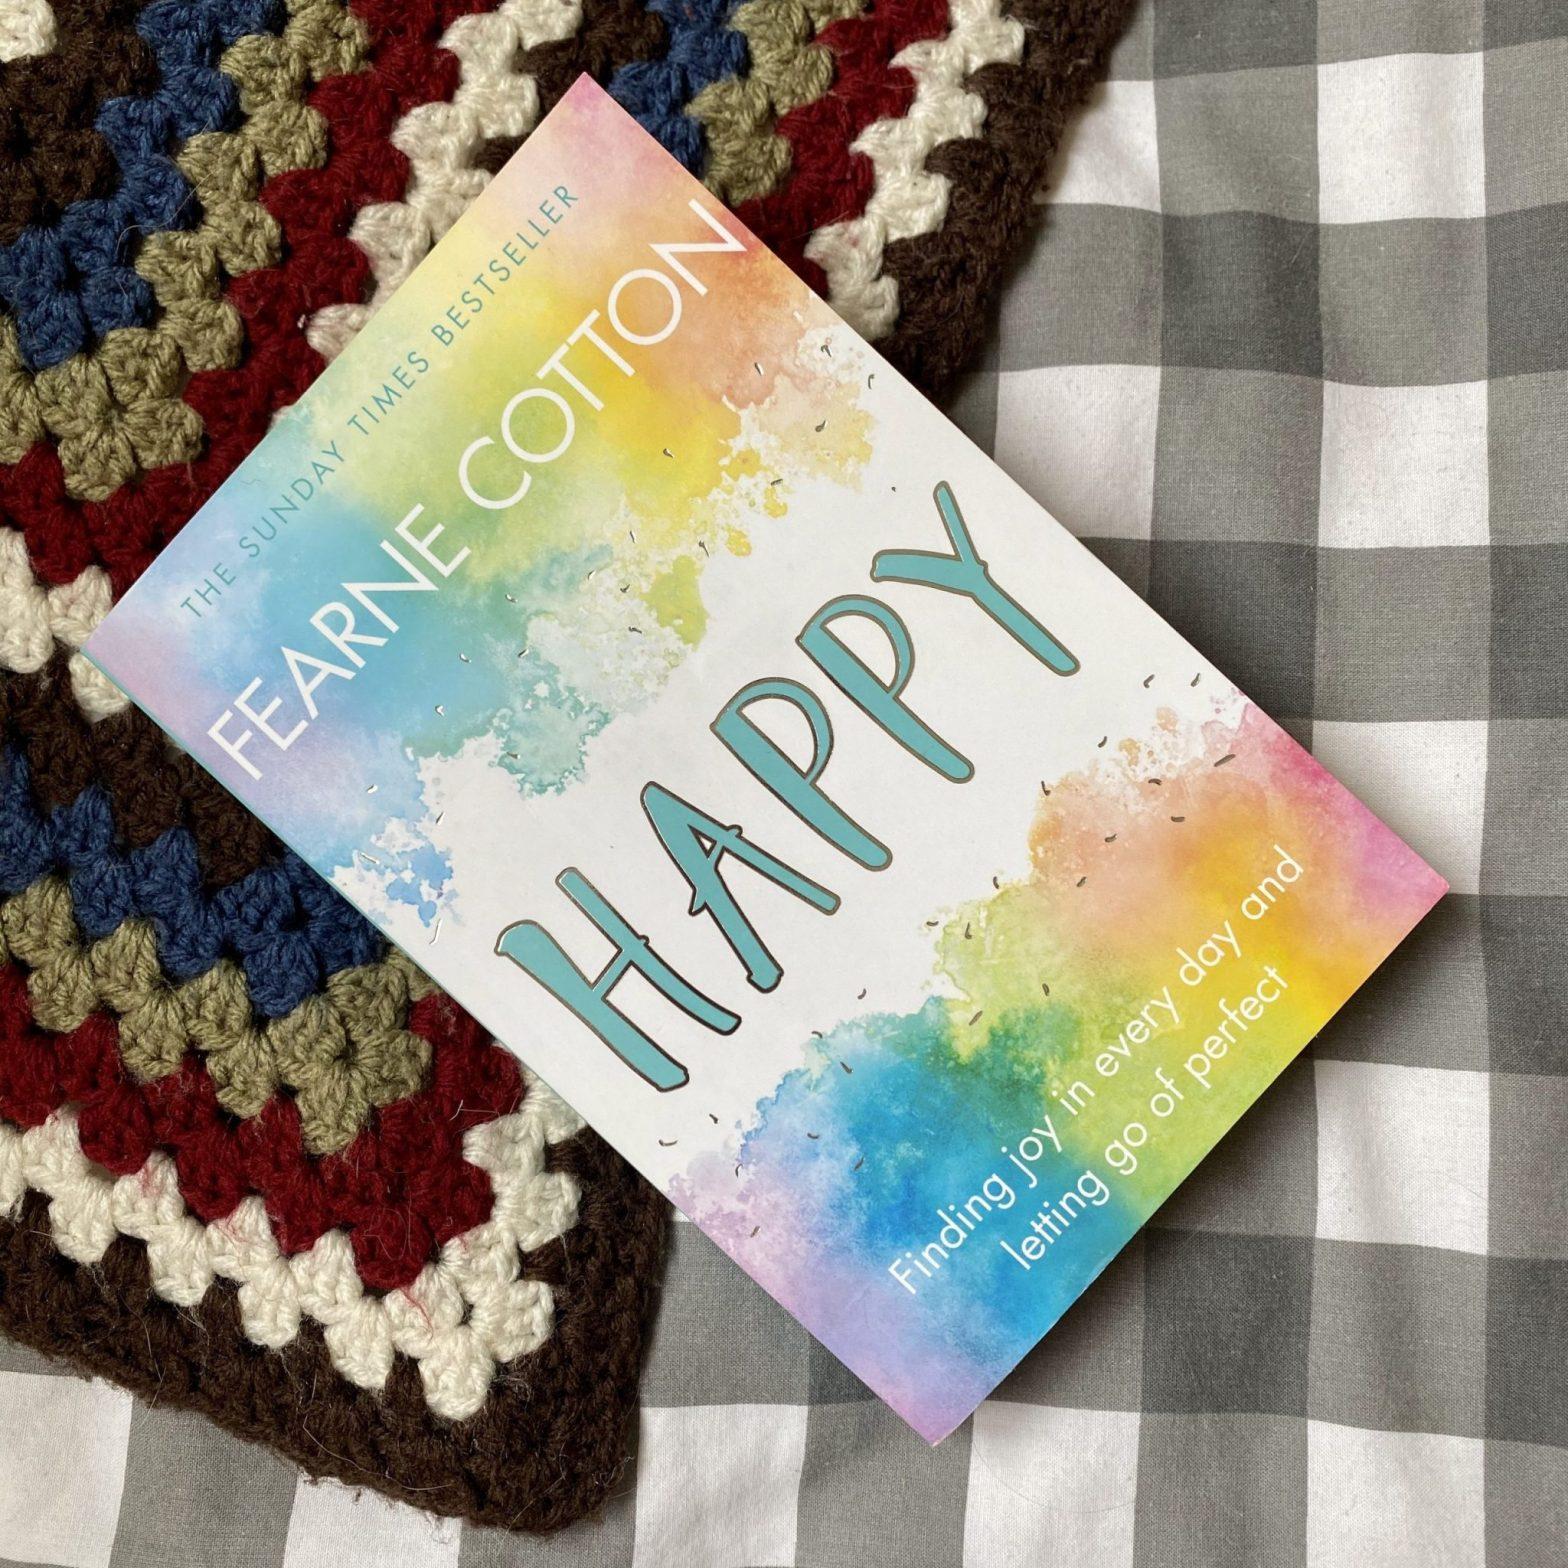 mental health, books, book club, reading, depression, bipolar, educational, insightful, daily wellness